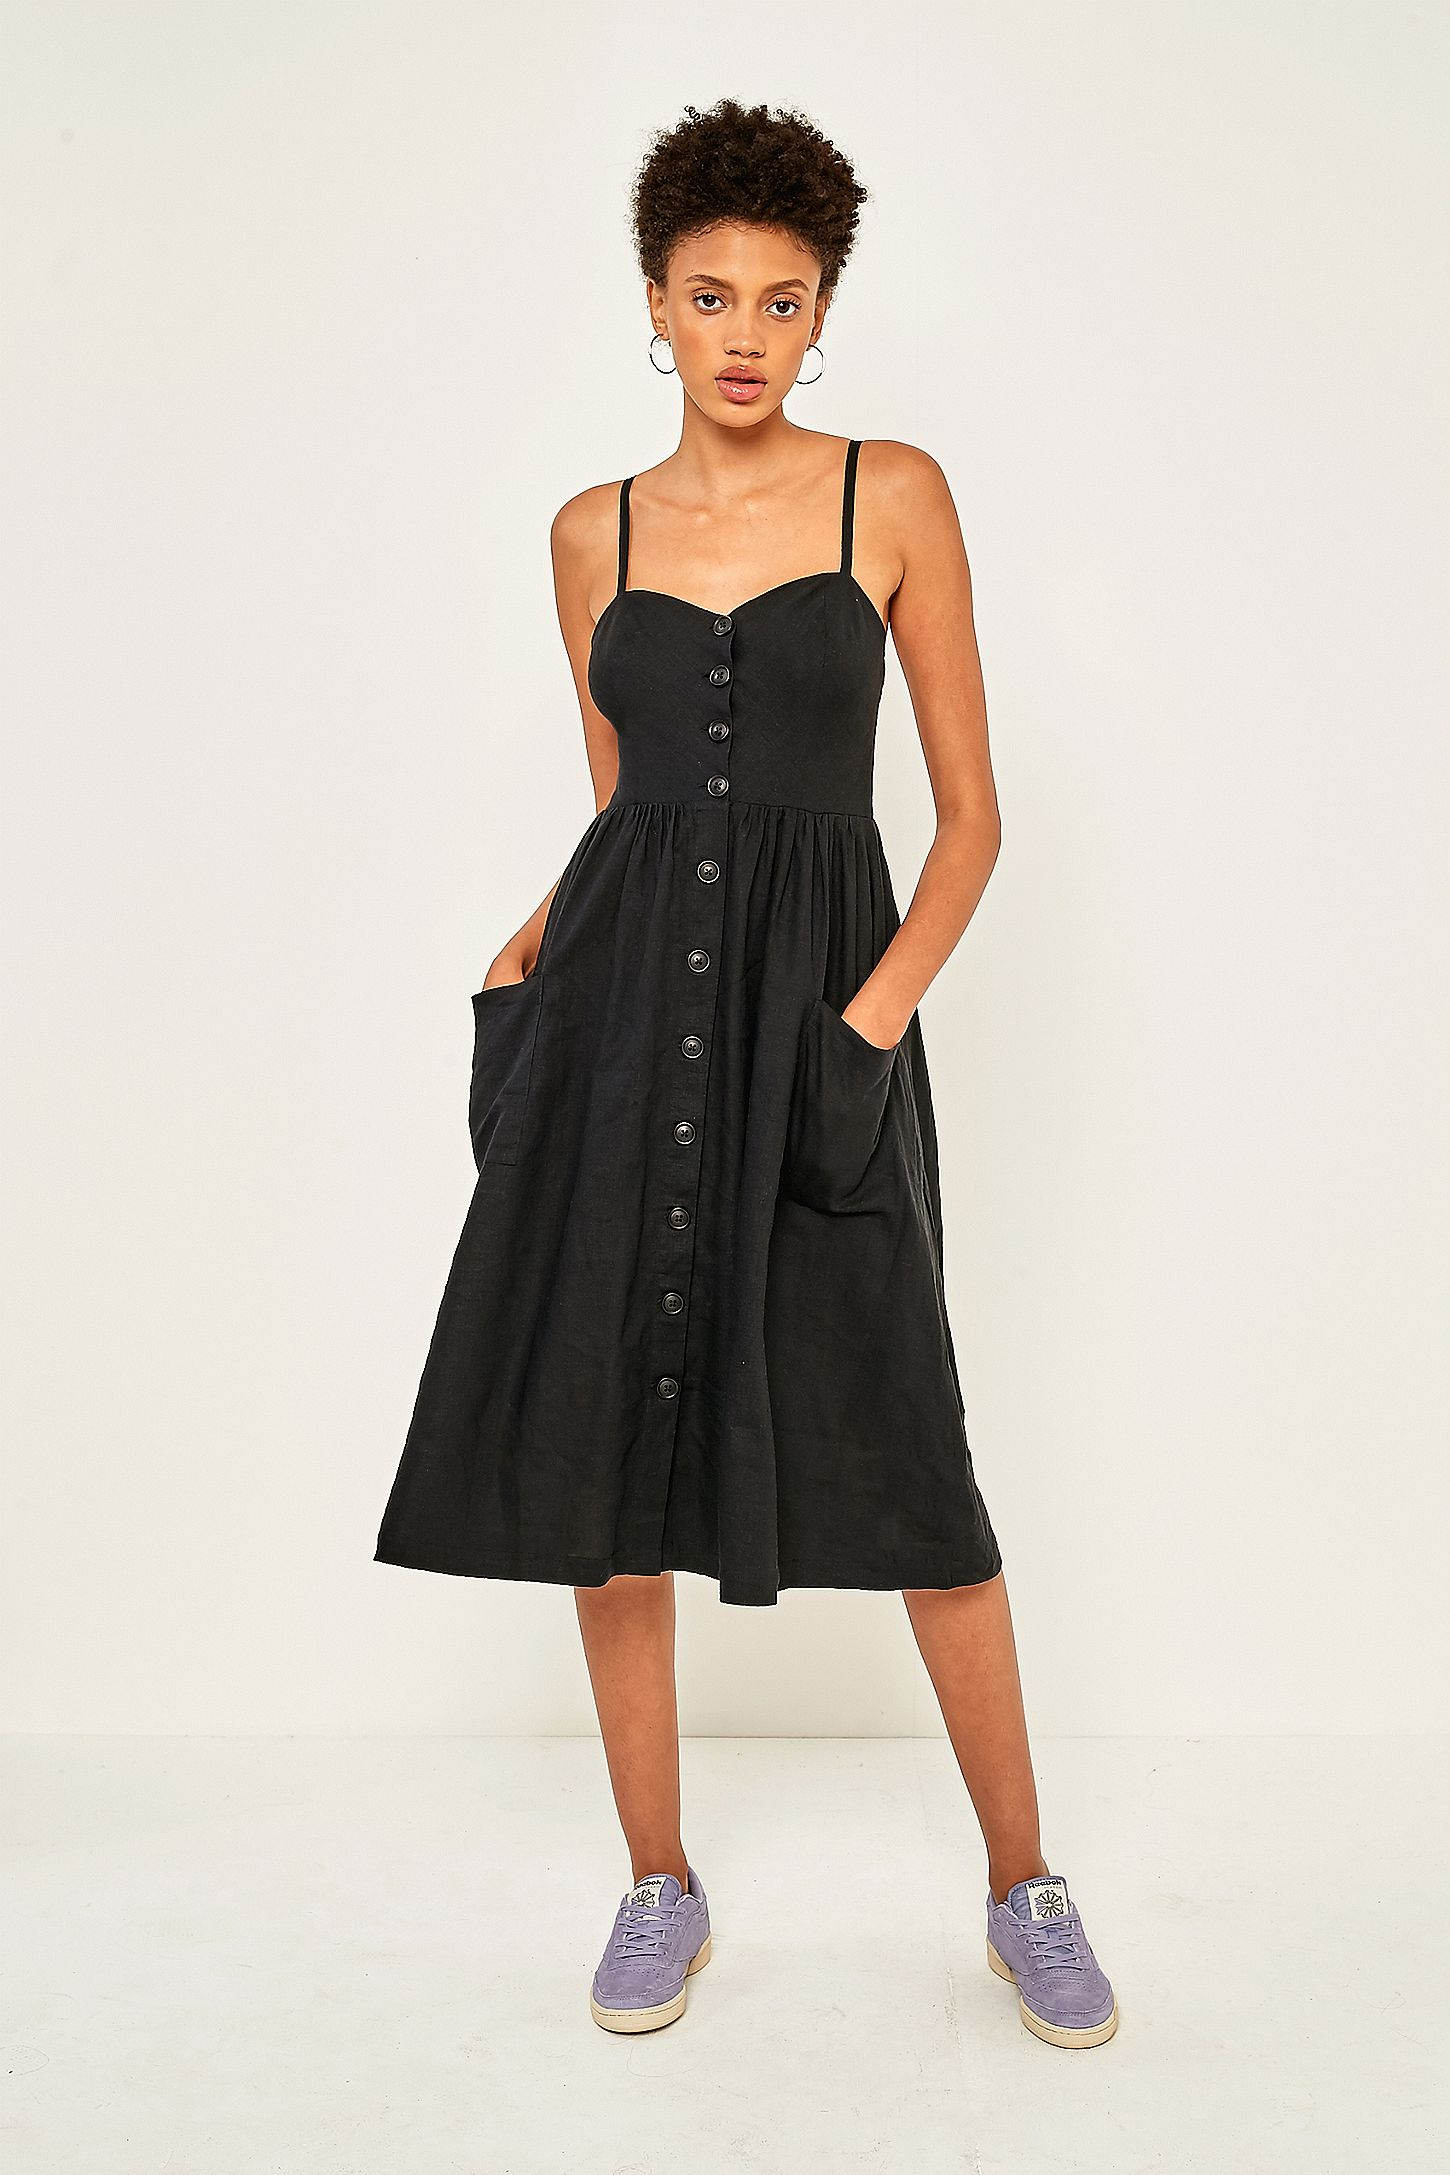 bb4ec789a74 Urban Outfitters Emilia Black Linen Button-Through Midi Dress ...